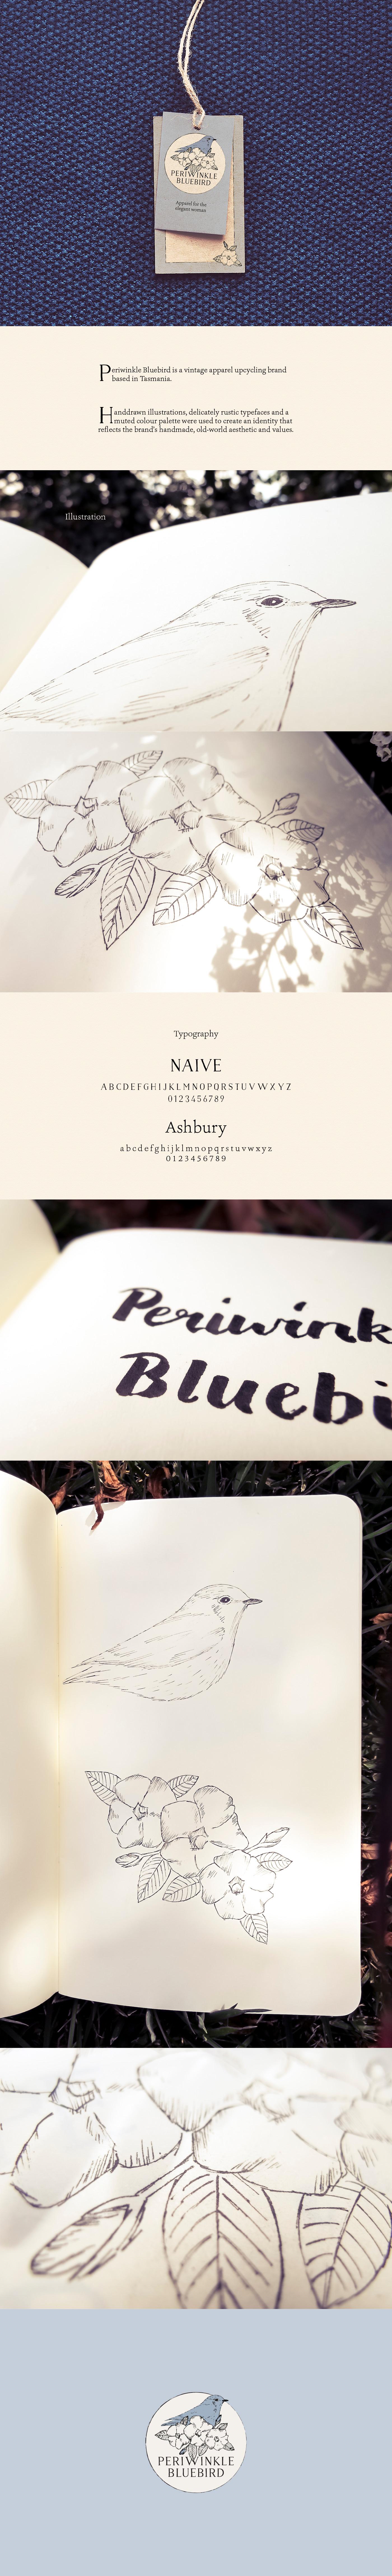 periwinkle BlueBird branding  ILLUSTRATION  Drawing  Nature Fashion  labels vintage tasmania